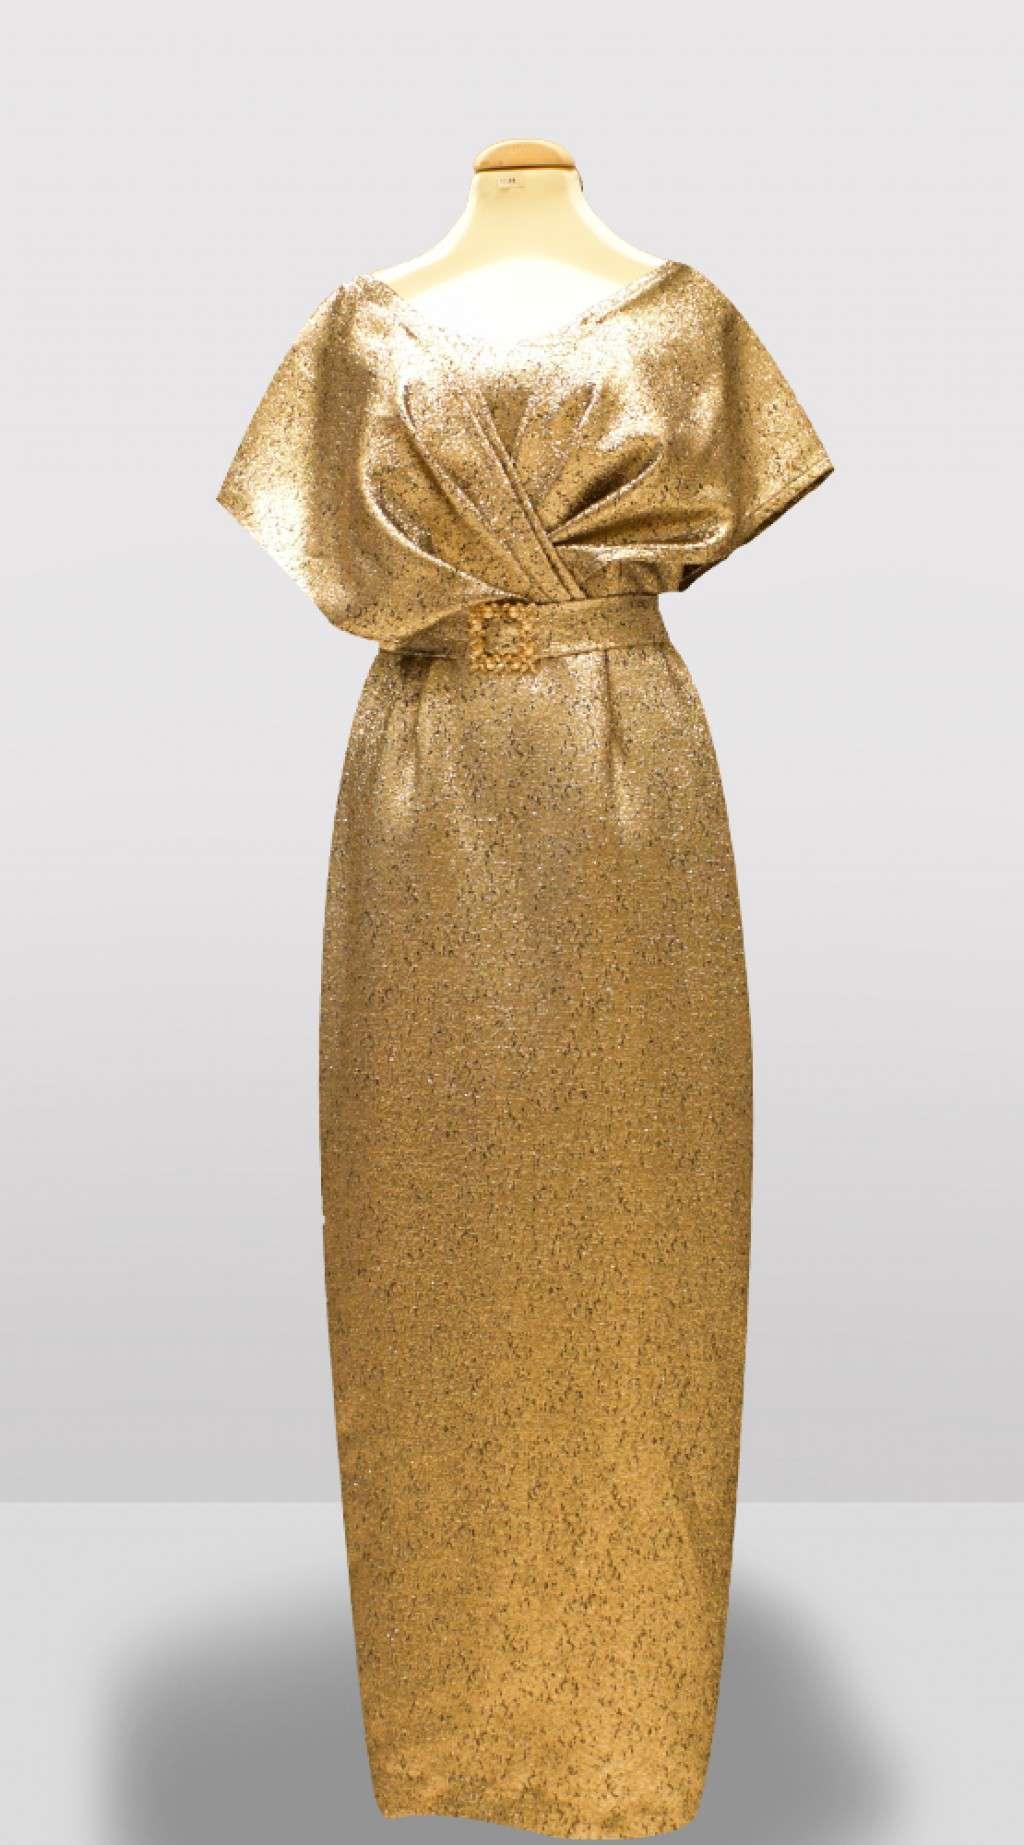 جاكار روماني ذهبي جهتين